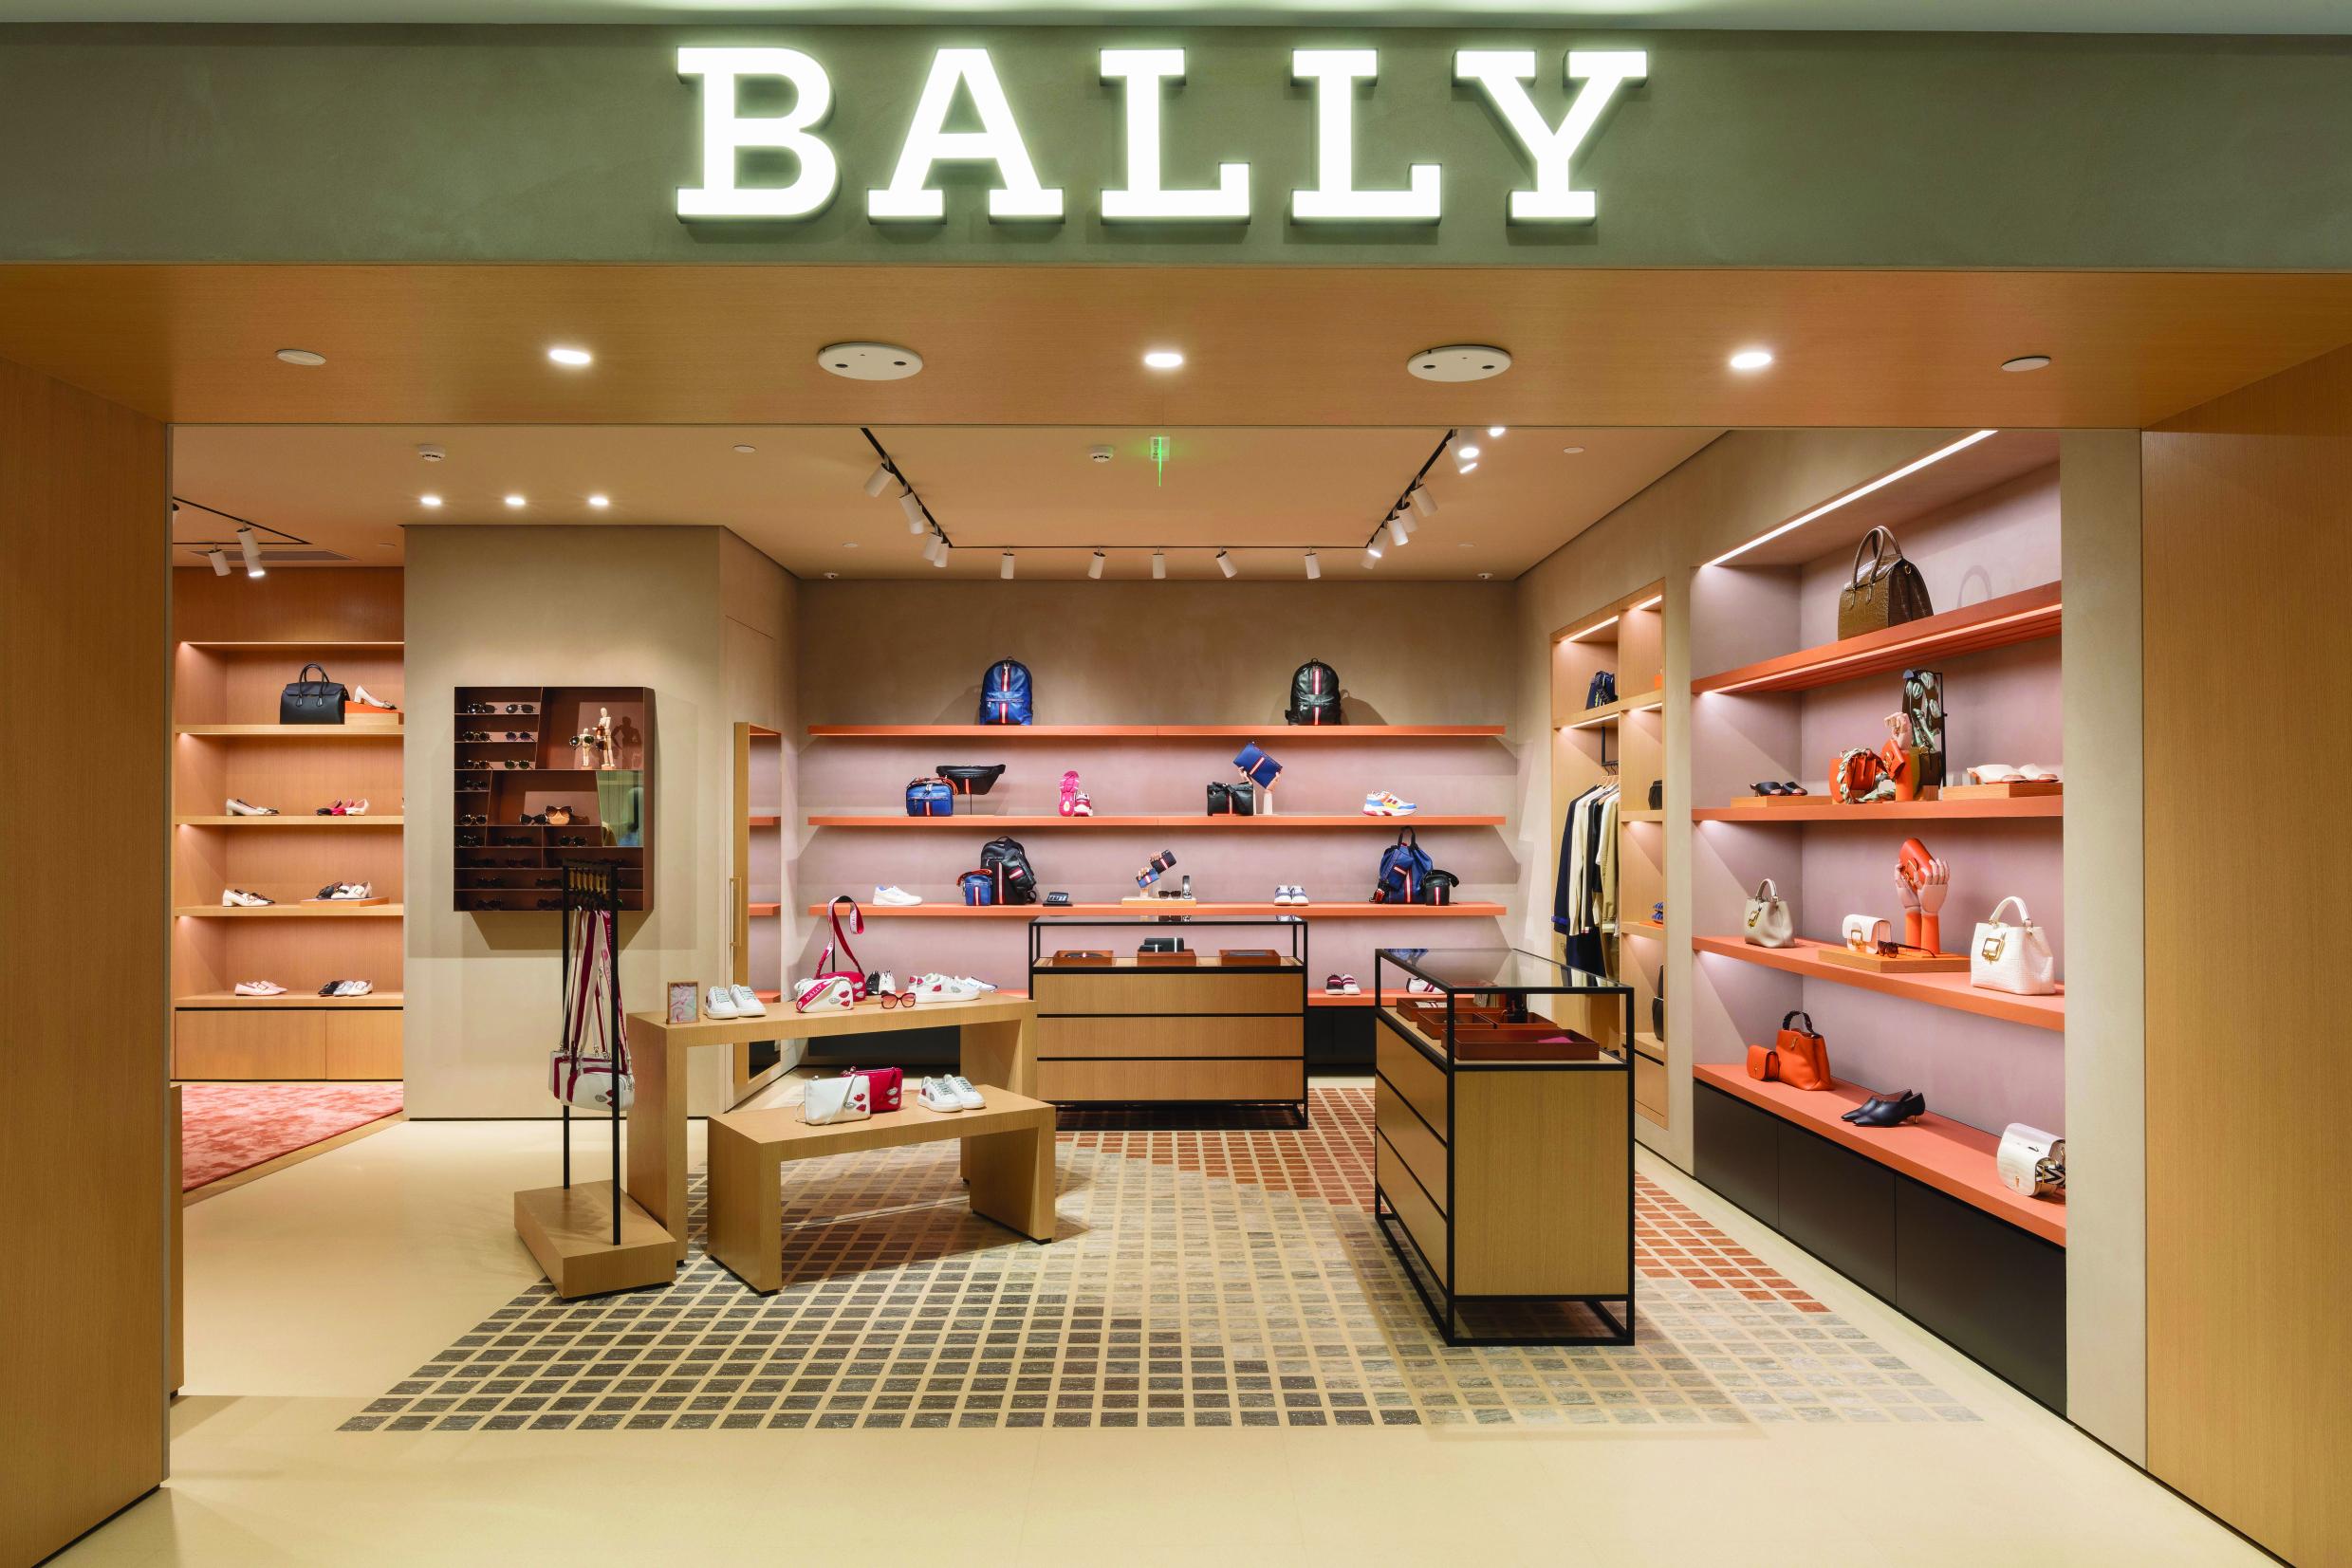 Bally Store_Hangzhou Tower (9).jpg